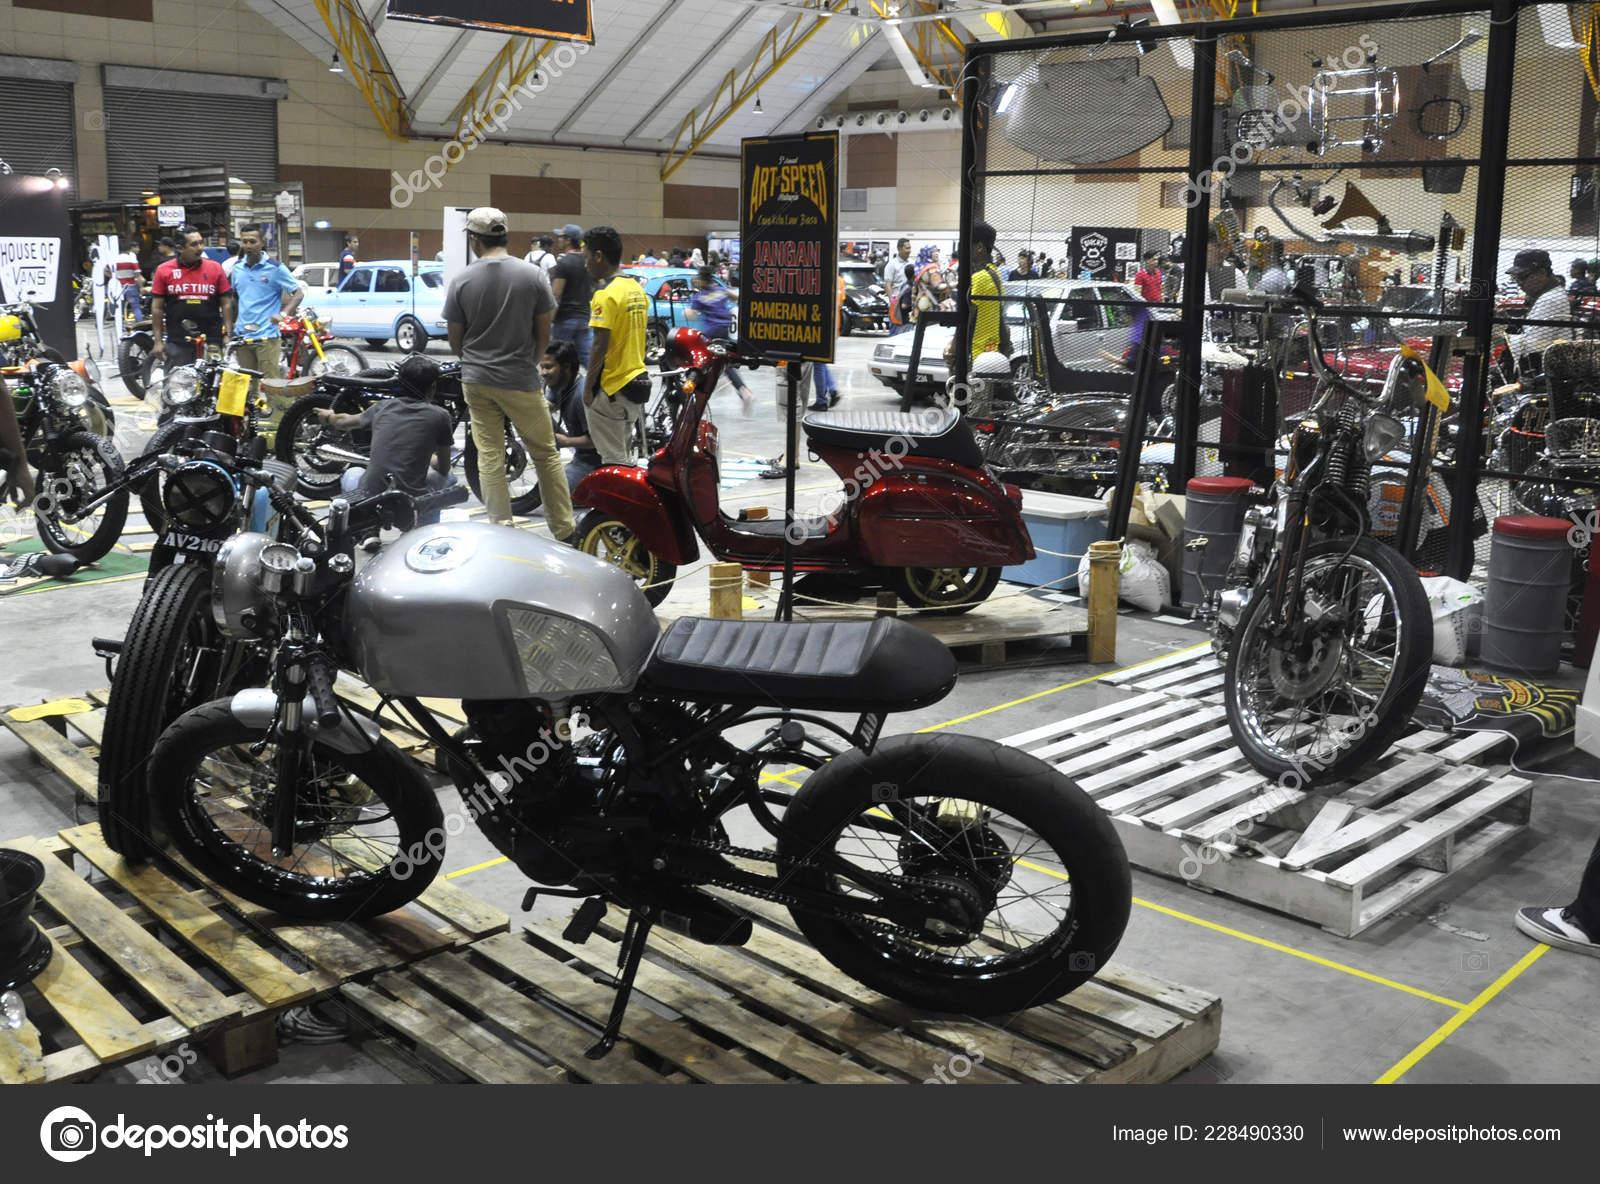 84f131c57757 Kuala Lumpur Malaysia June 2017 Big Bike Motorcycle Display Huge — Stock  Photo